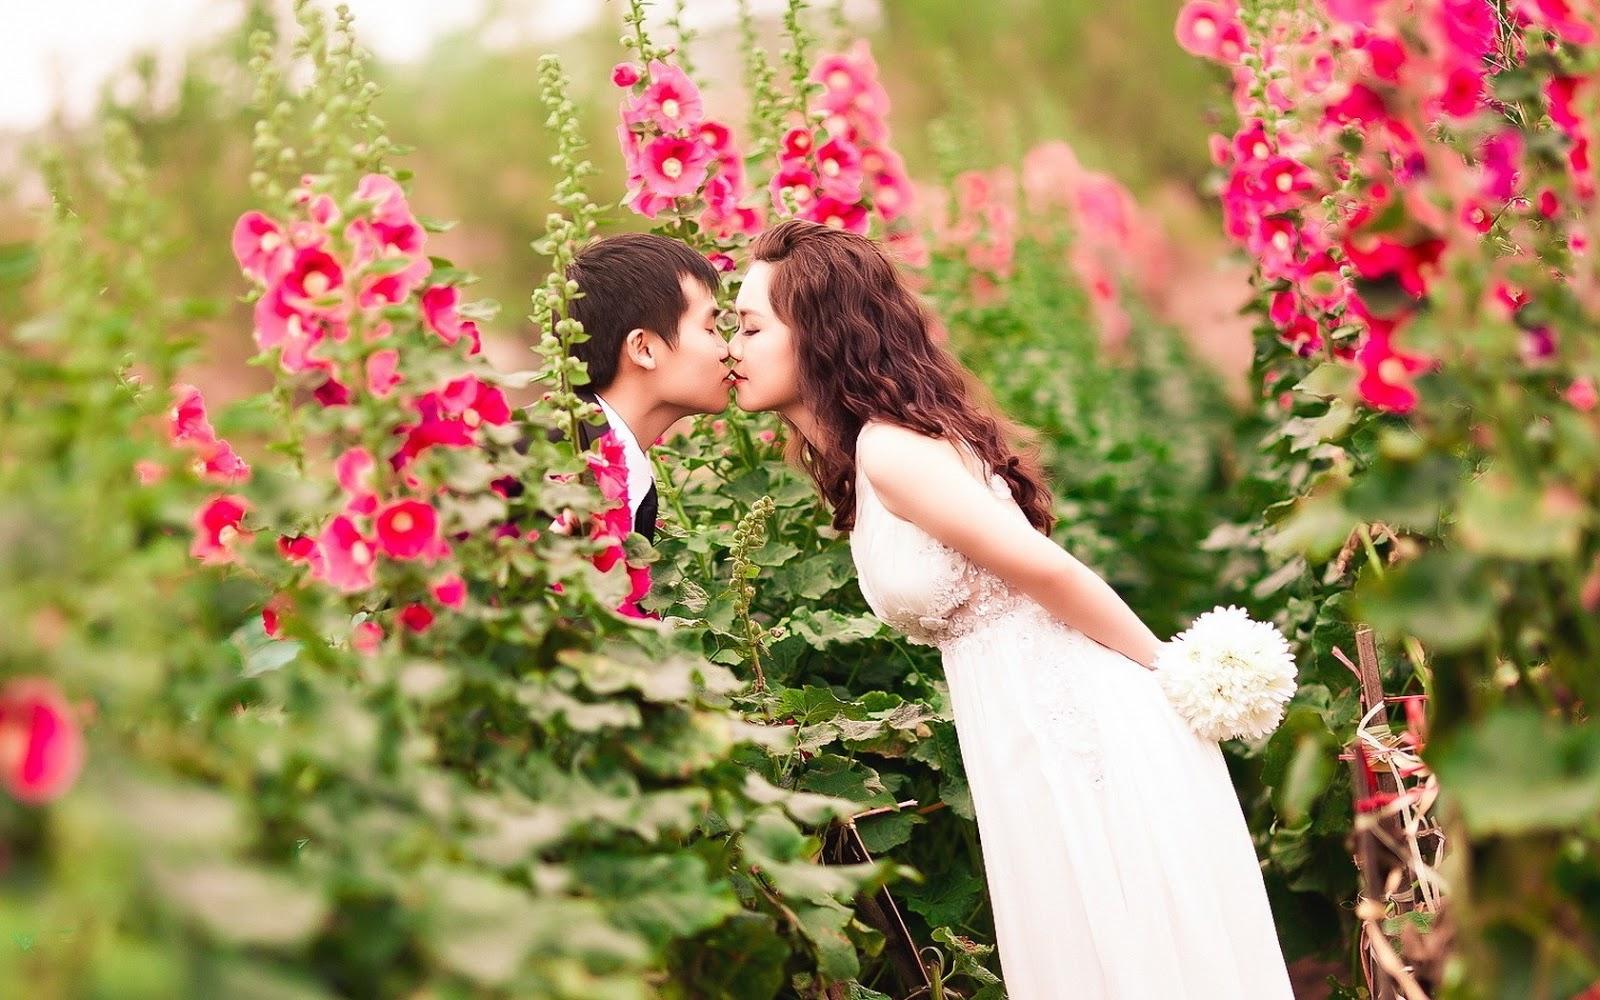 Photo Romantis Berpelukan